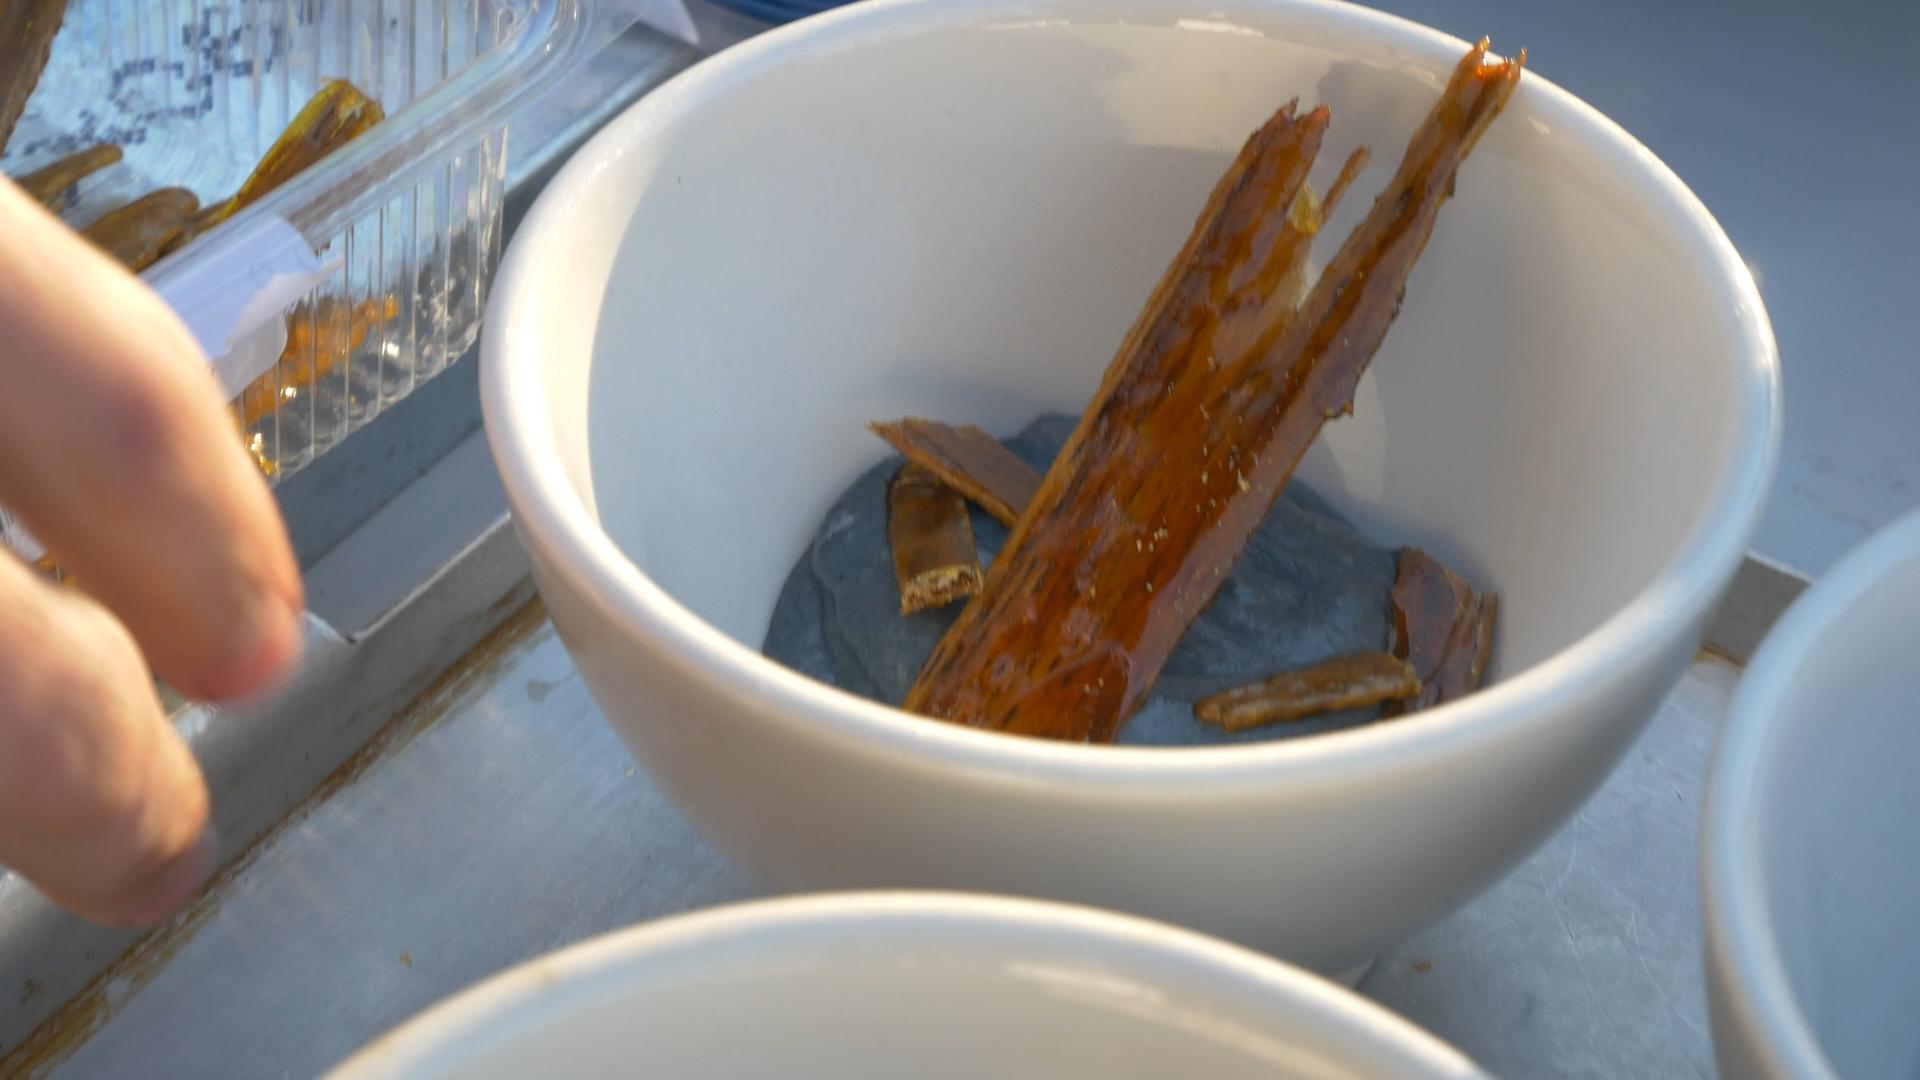 Wafer - Coal custard with caramelised wood wafer